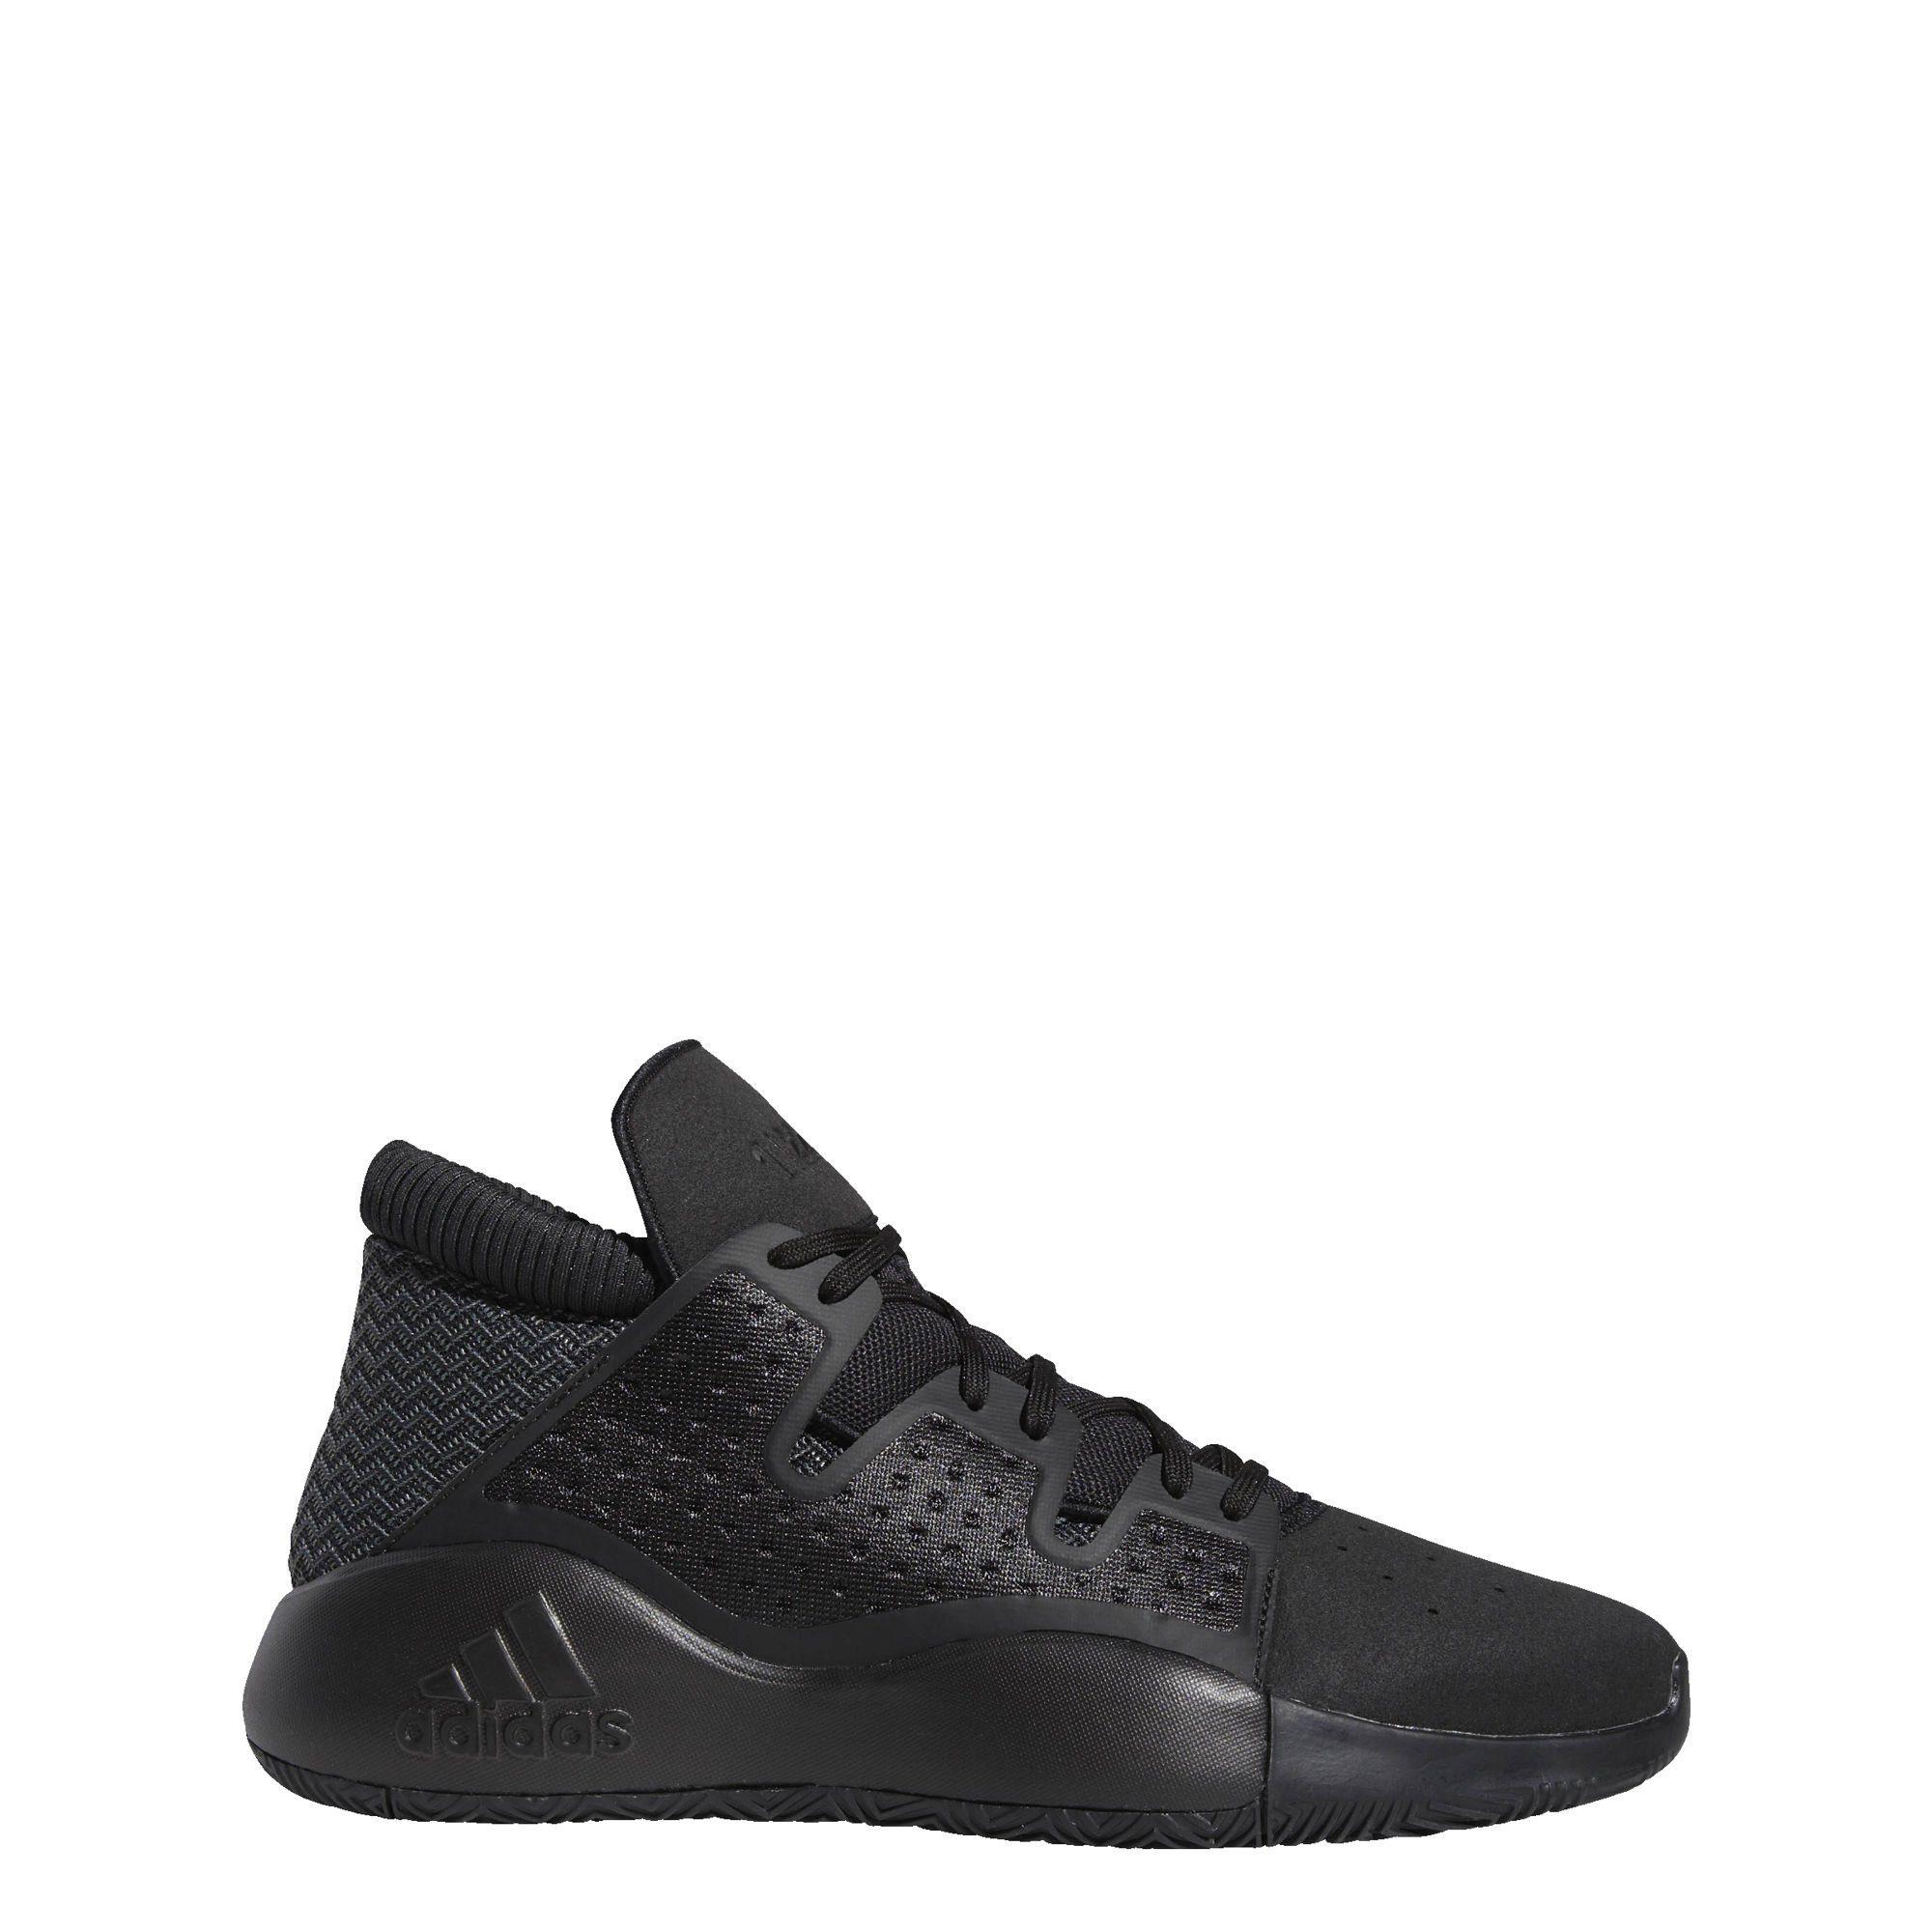 adidas Performance »Pro Vision Schuh« Outdoorschuh Outdoorschuh online kaufen   OTTO